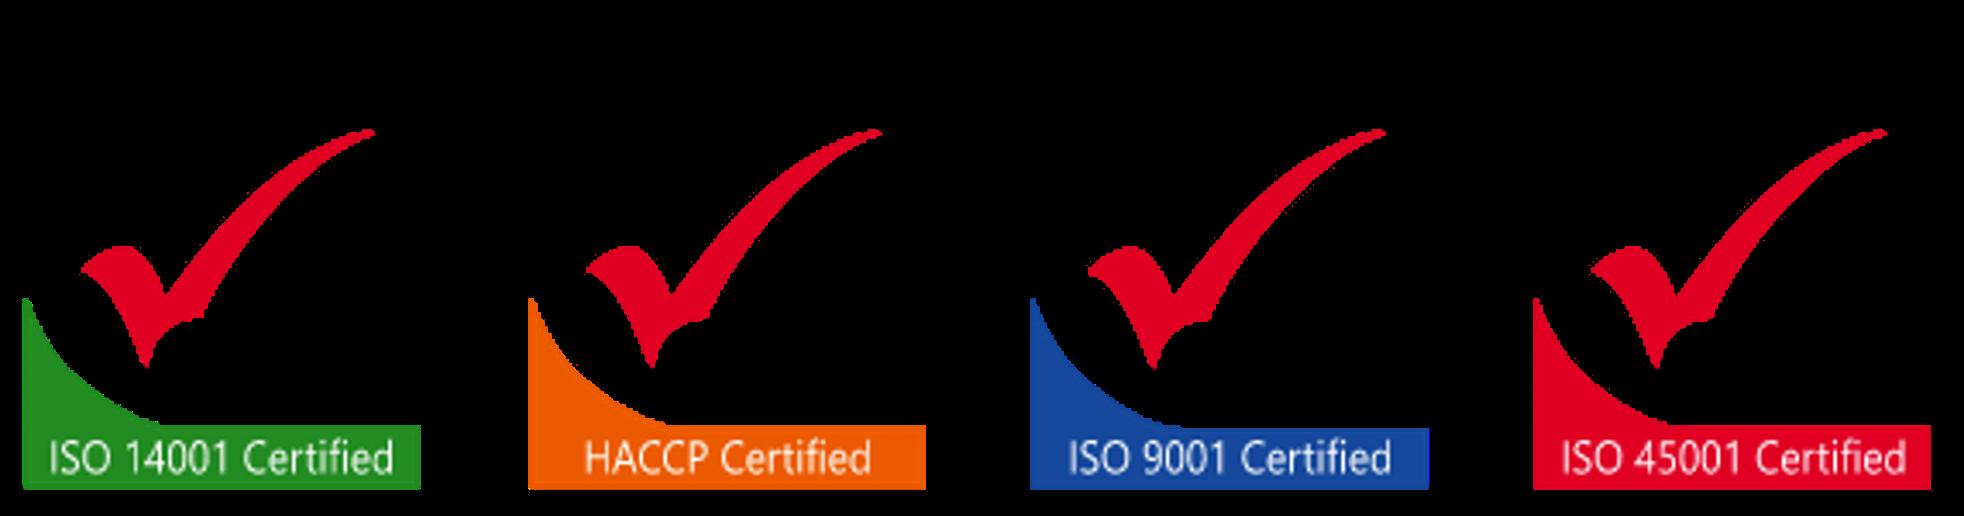 GCC Certifications